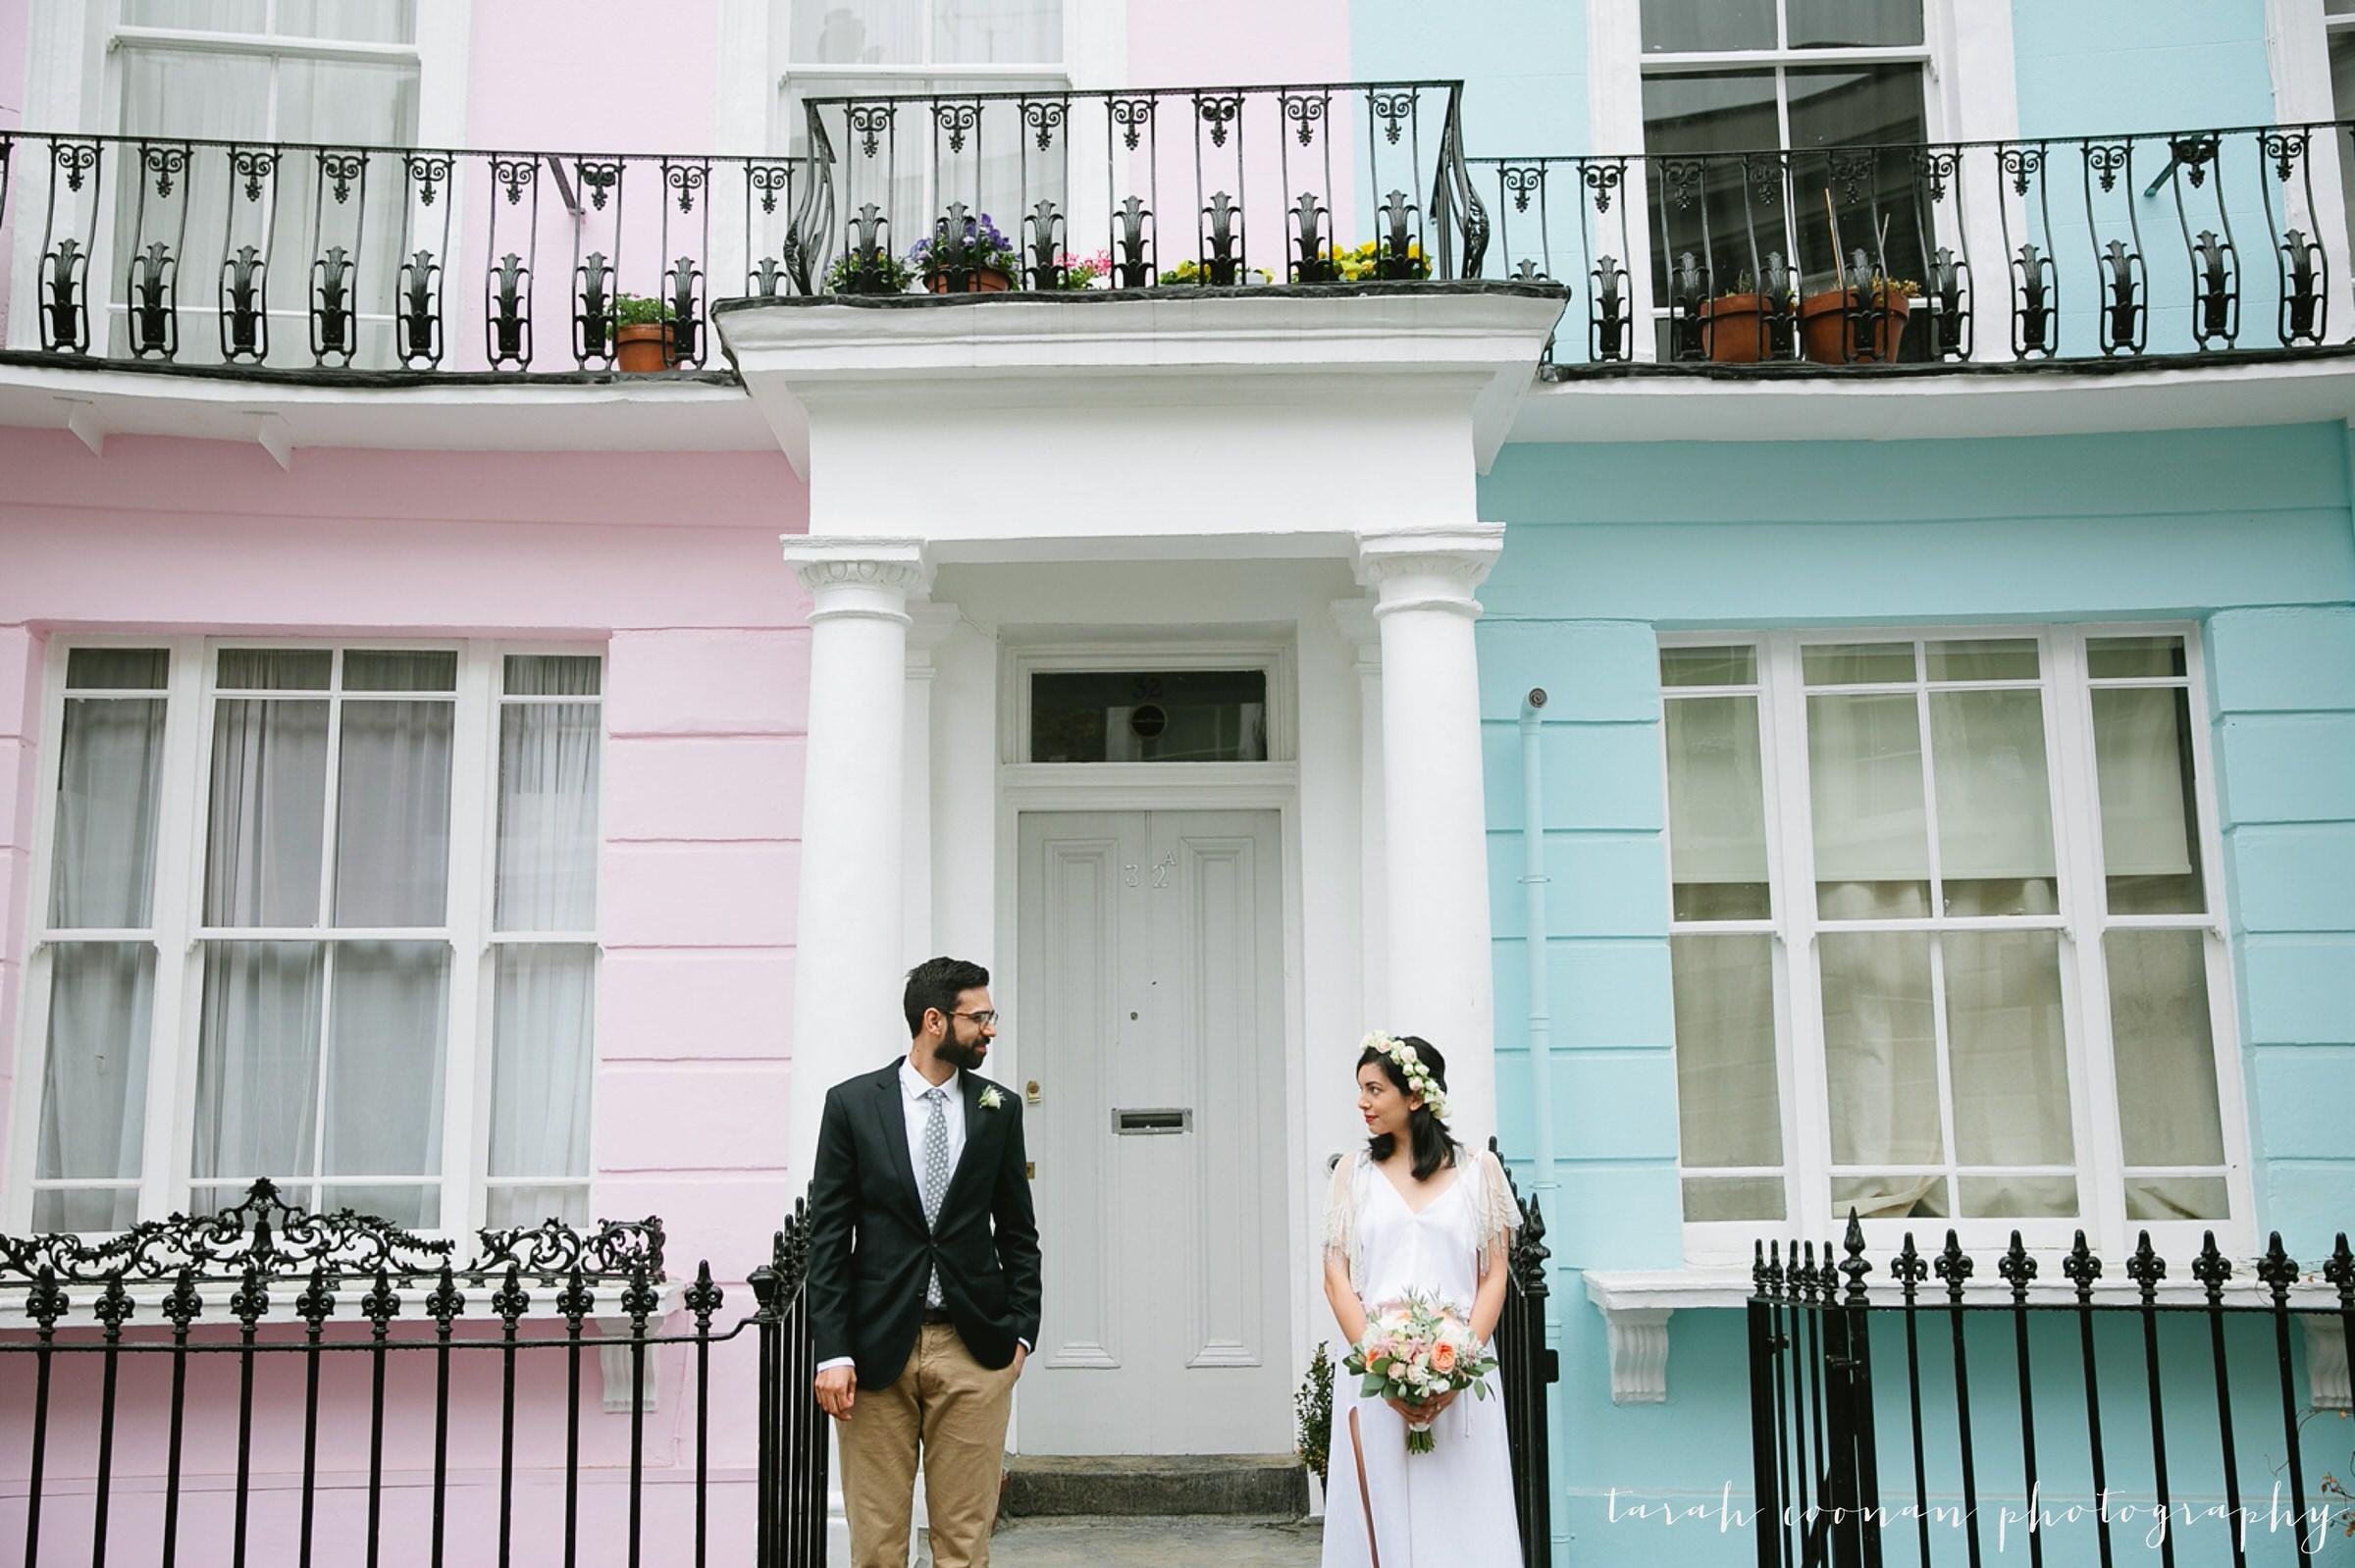 pastel houses london